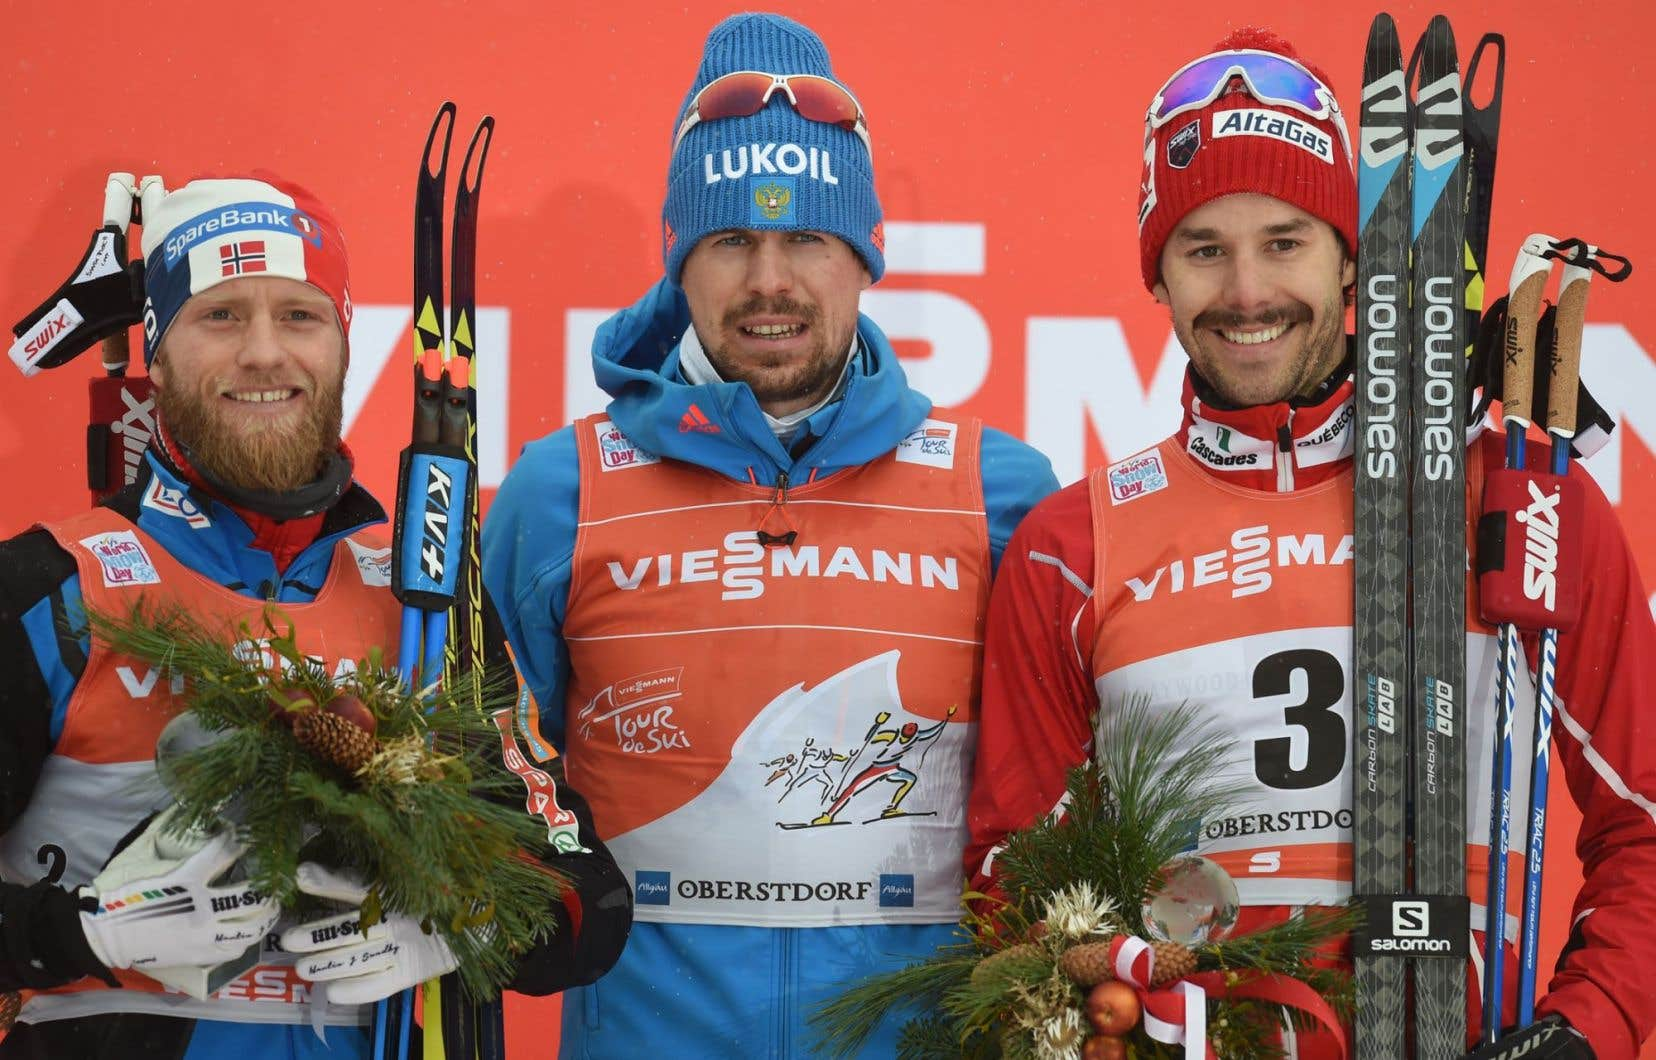 Le Norvégien Martin Johnsrud Sundby (2e), le Russe Sergey Ustiugov (1er) et le Canadien Alex Harvey (3e)